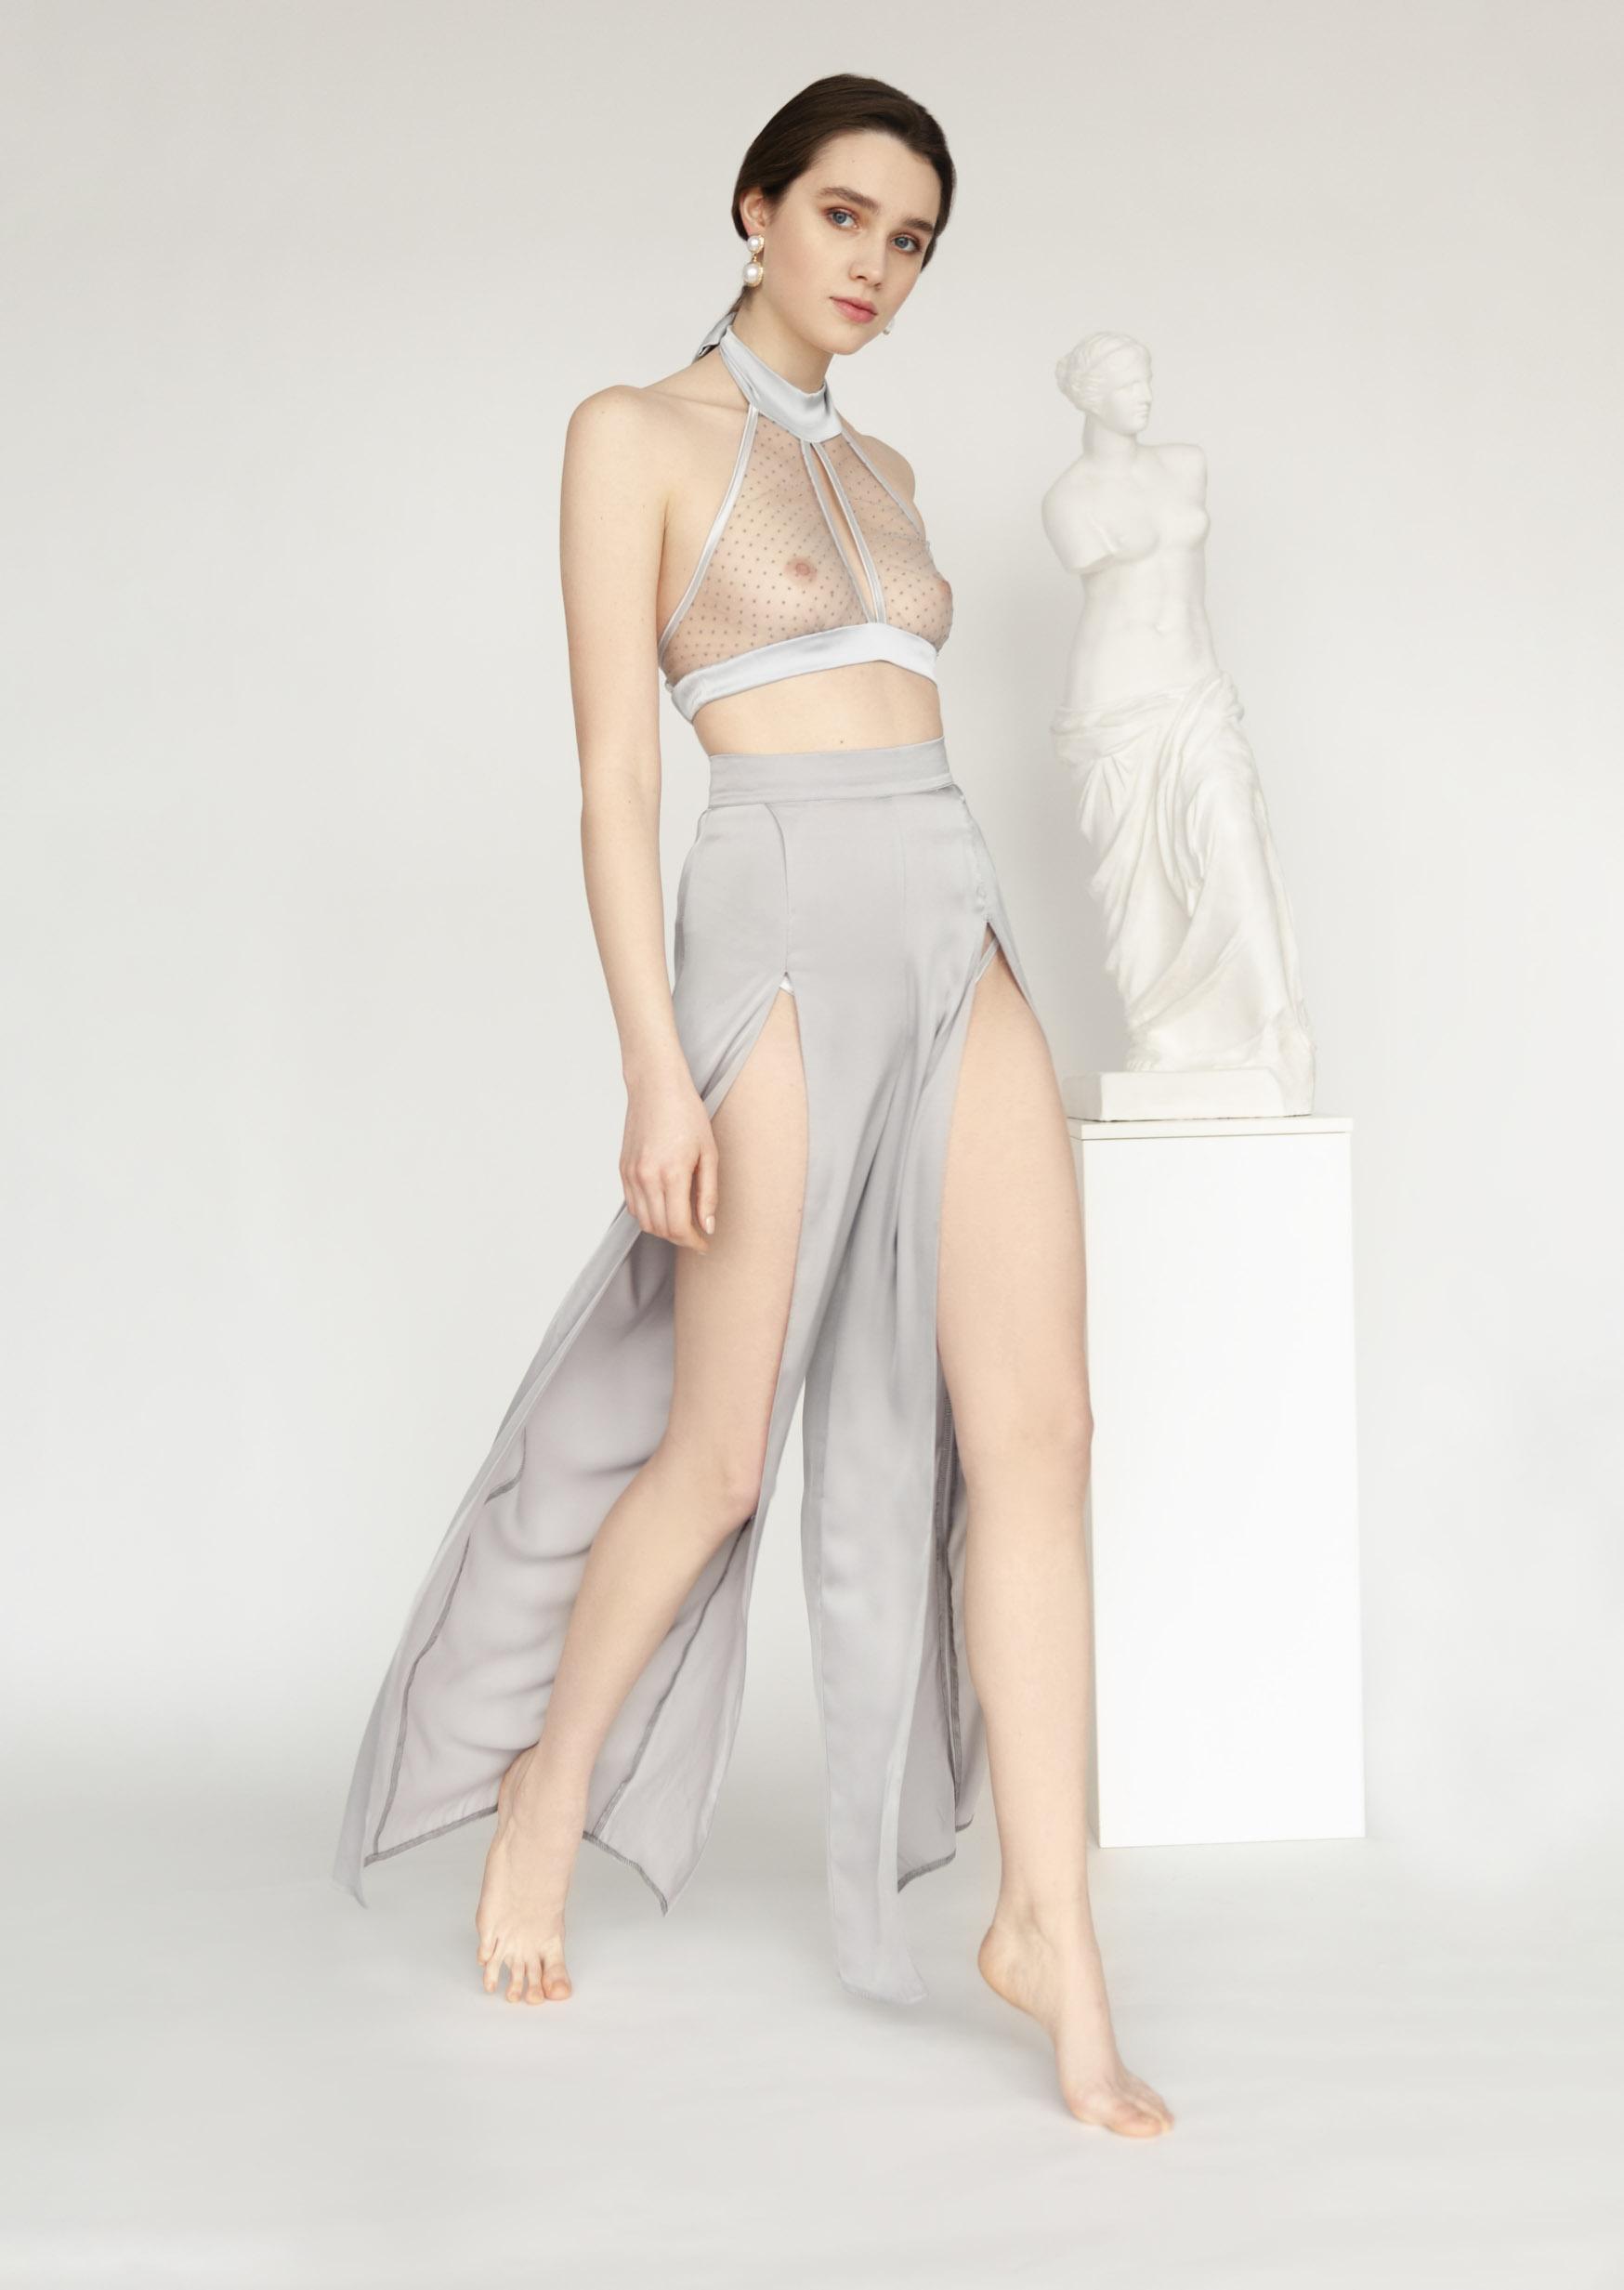 Silk step pants satin sleep pants with deep slits on both legs